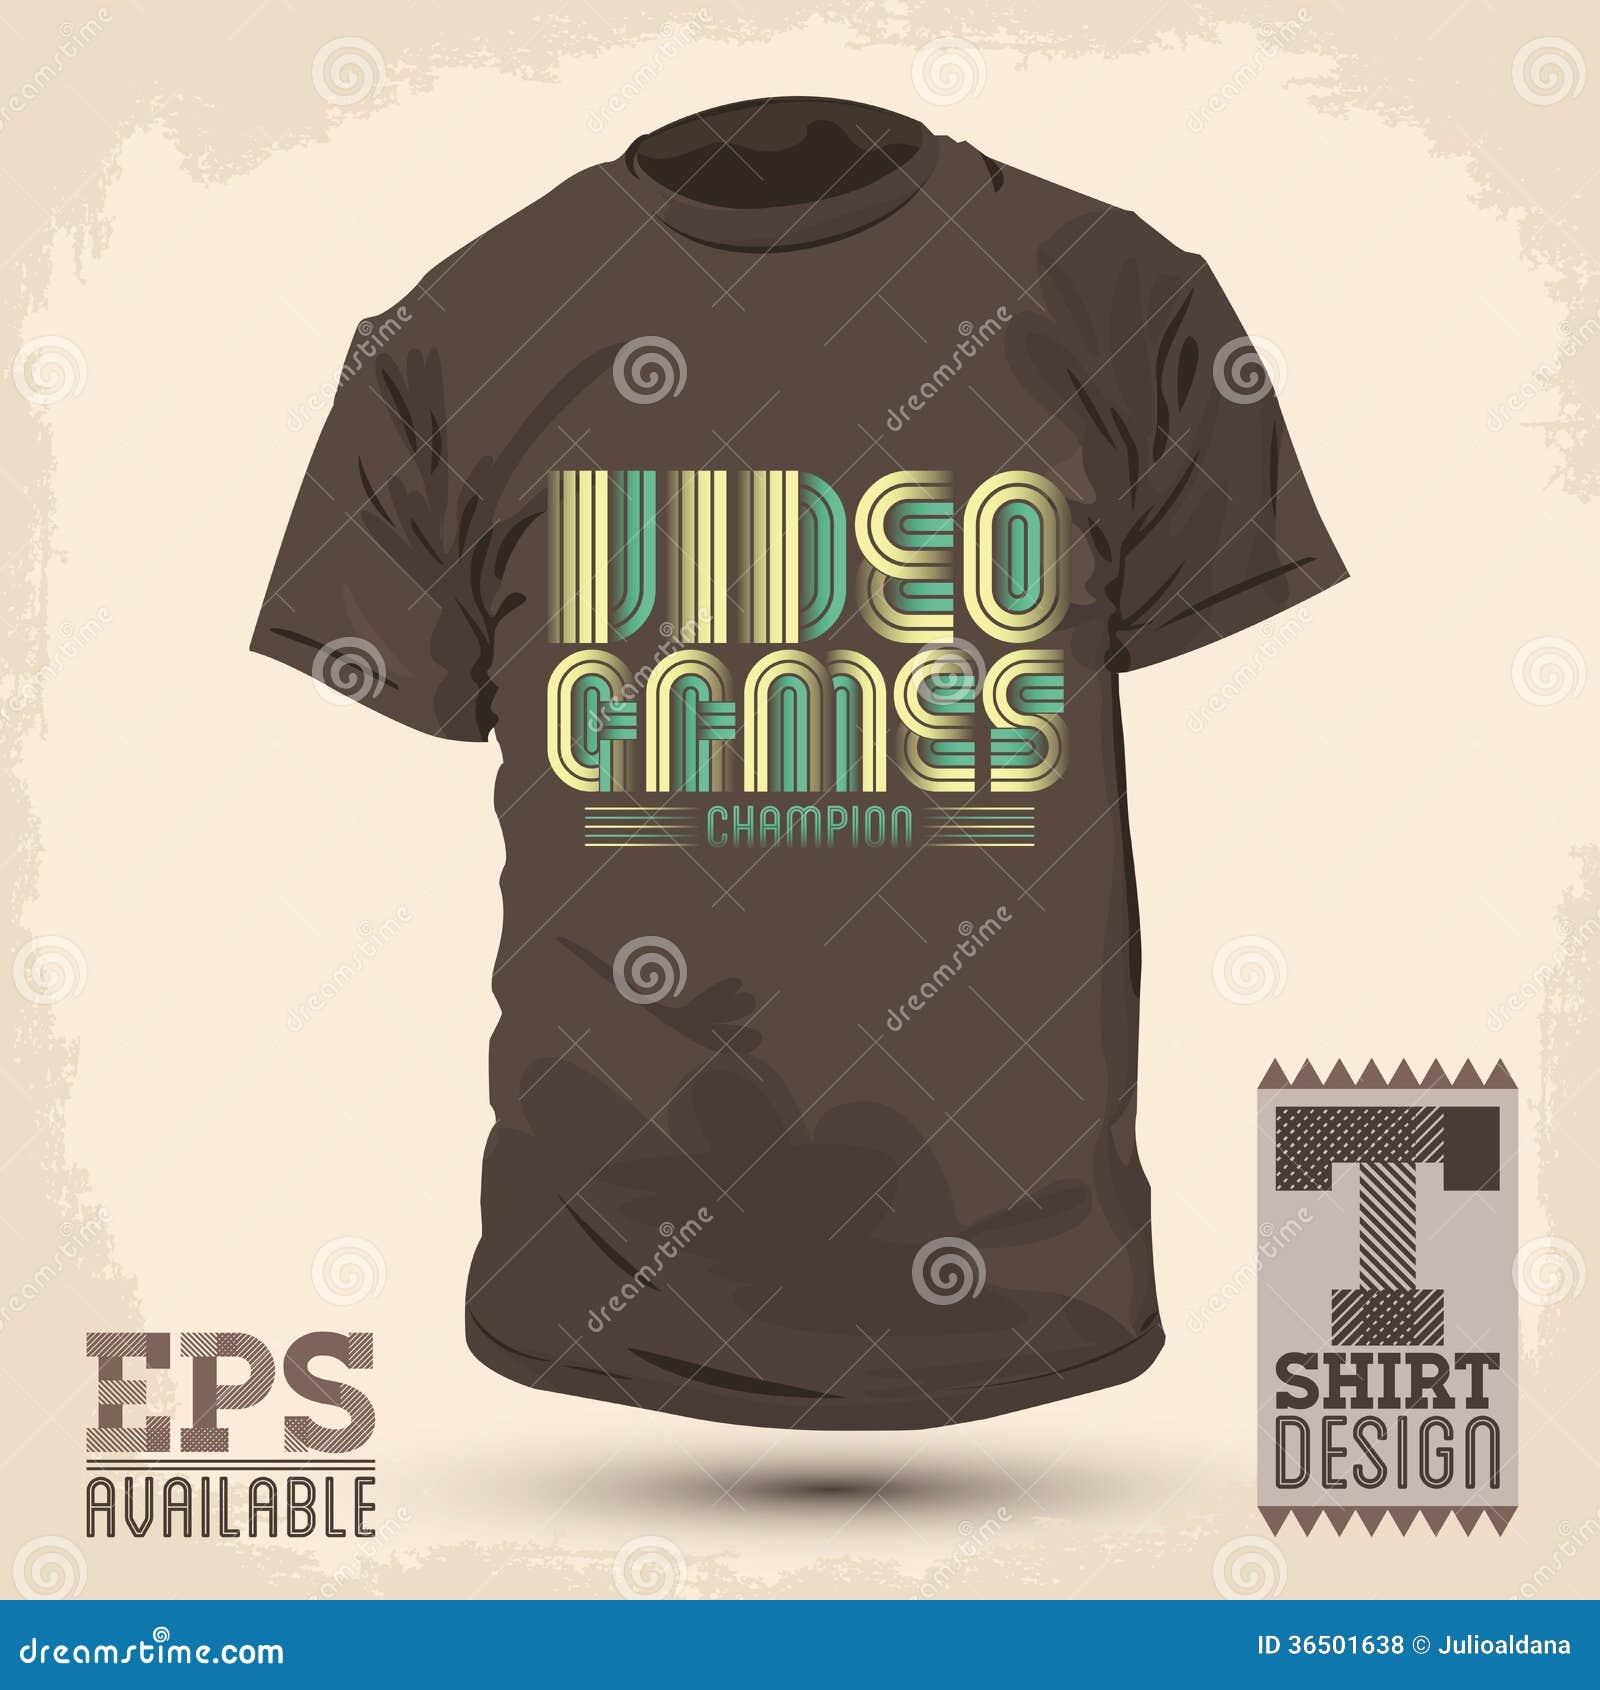 Shirt design games - Vintage Graphic T Shirt Design